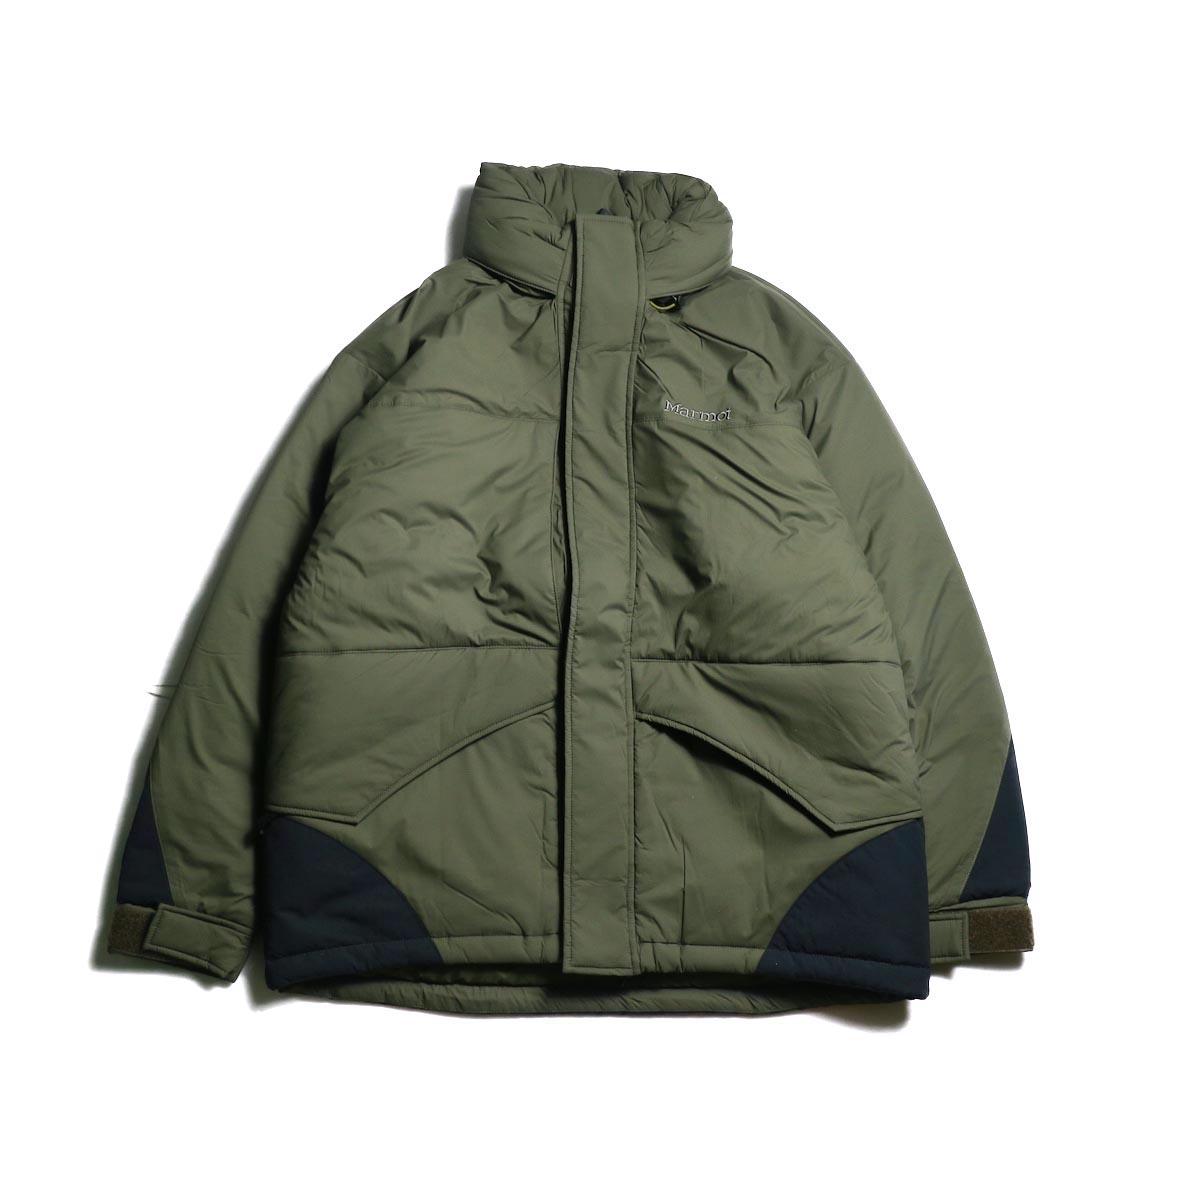 Marmot Histric Collection / Randonnee Loft Jacket (Dk.Olive x Black)